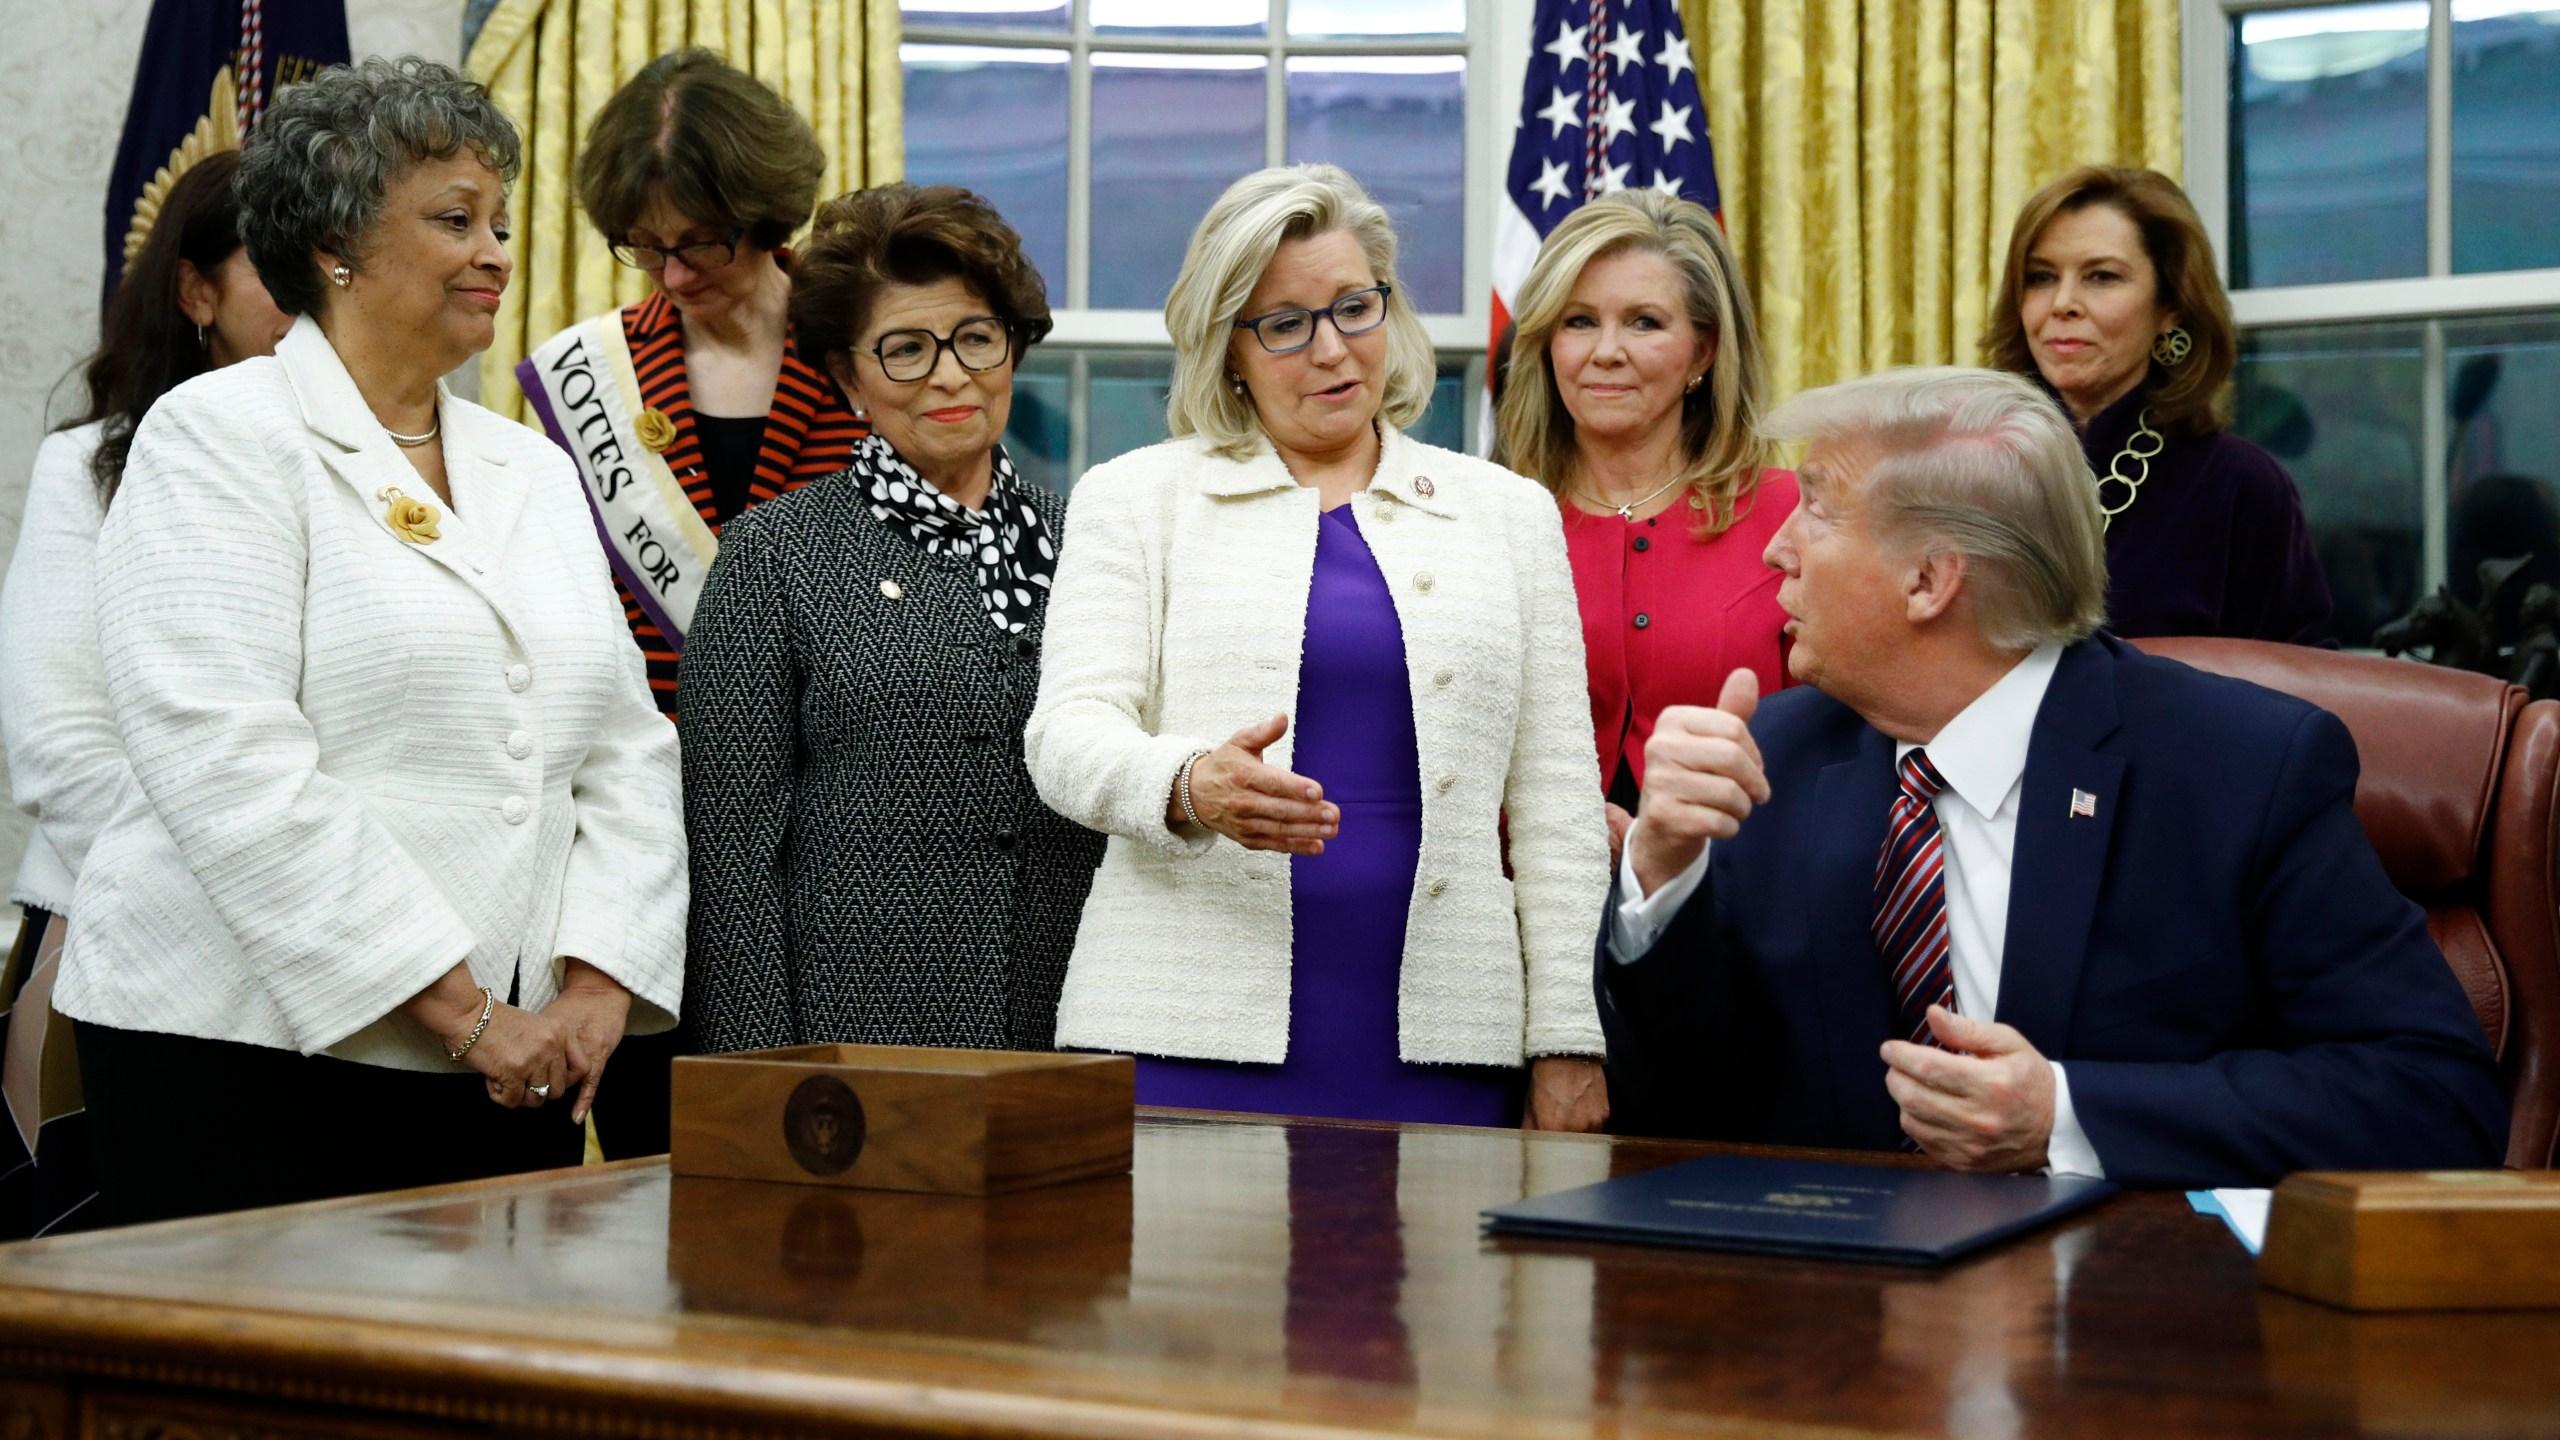 Donald Trump, Liz Cheney